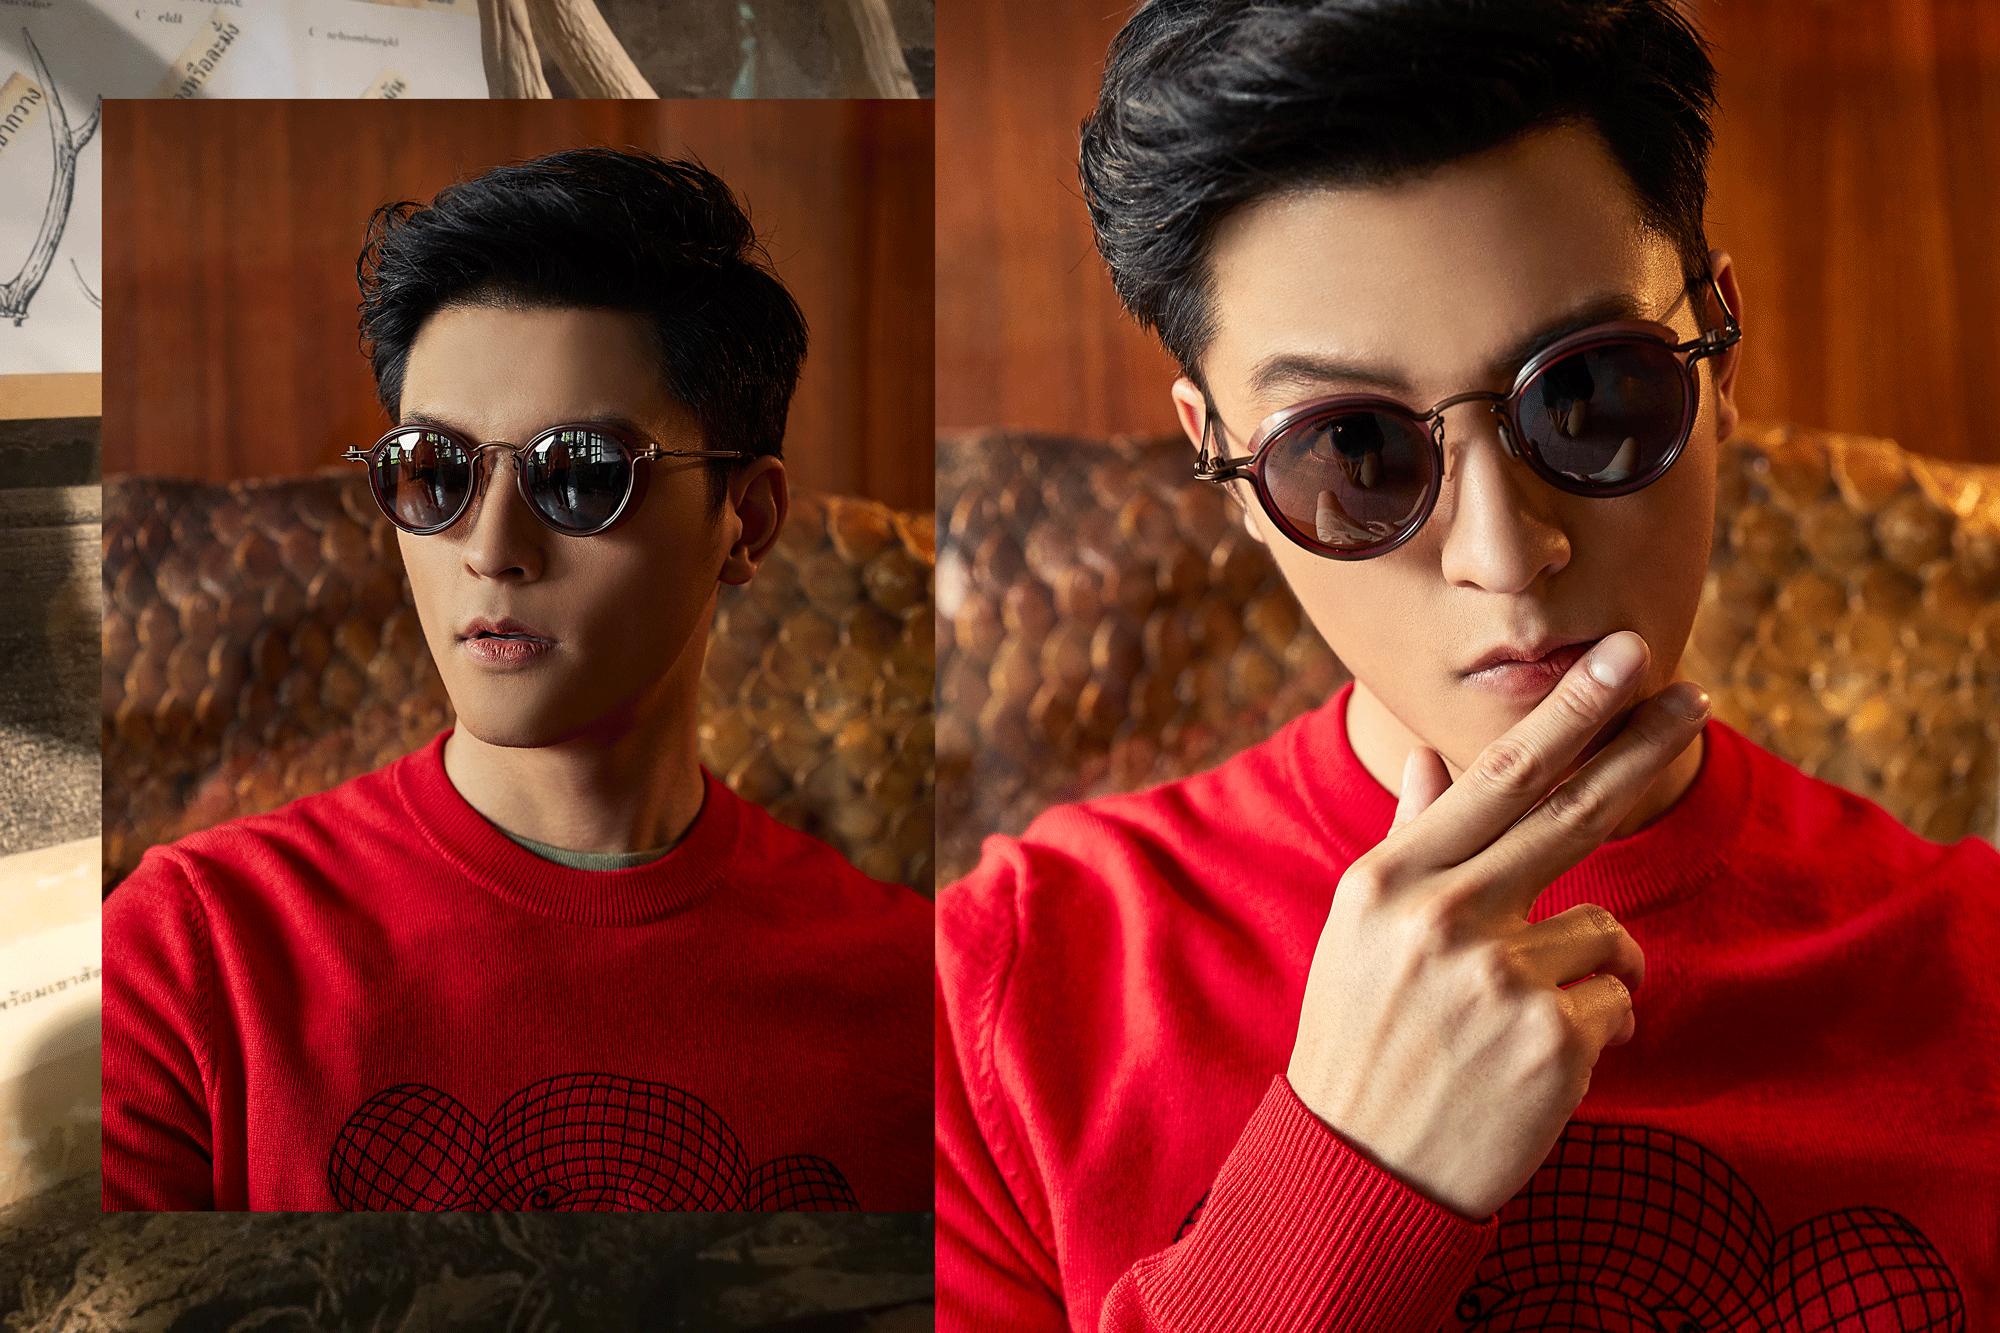 sweater : BlacK Barrette / sunglasses : TAVAT